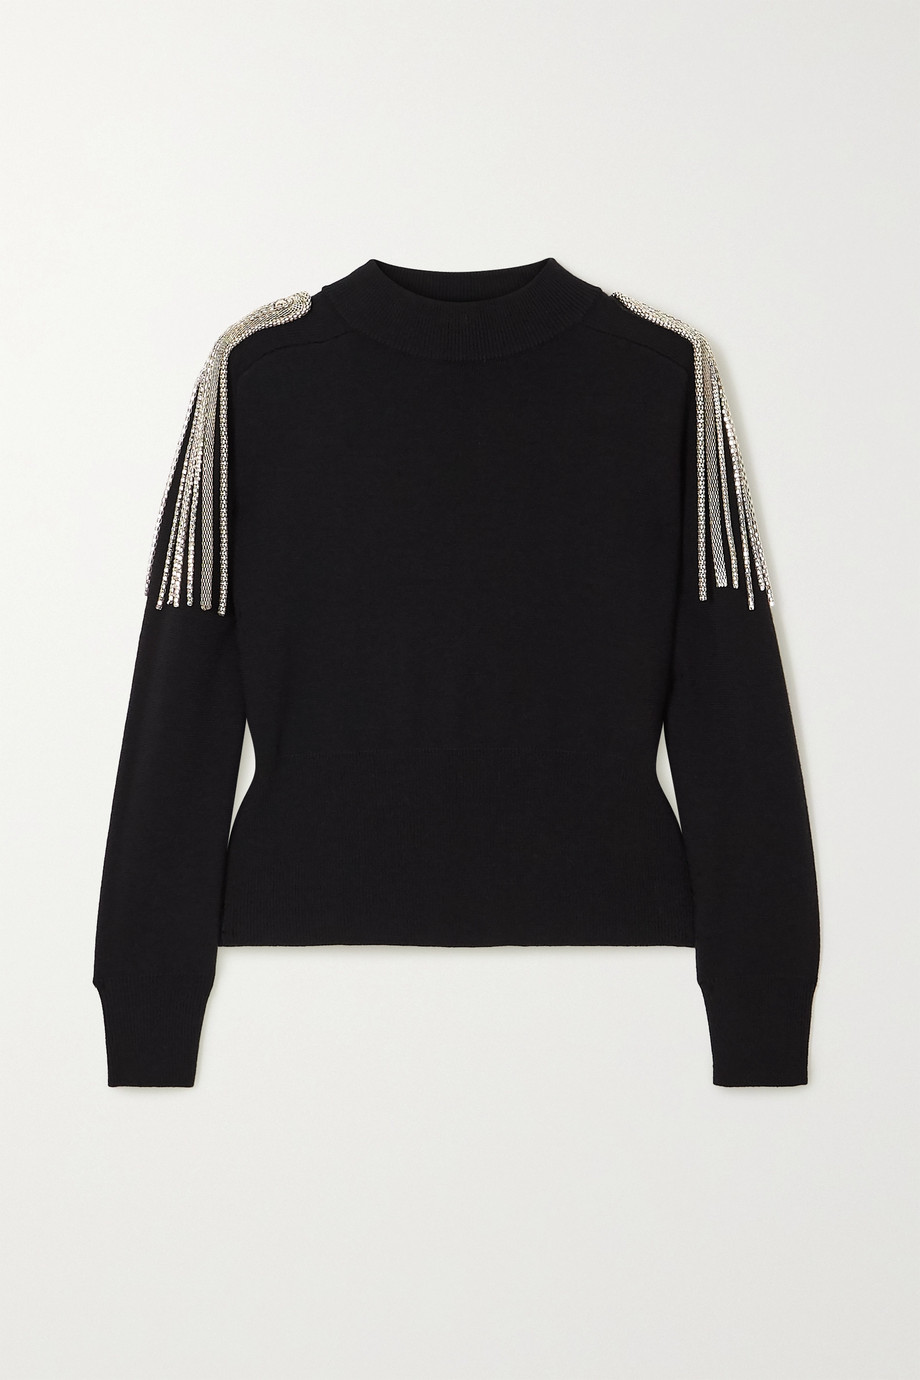 Christopher Kane Cropped chain-embellished merino wool sweater